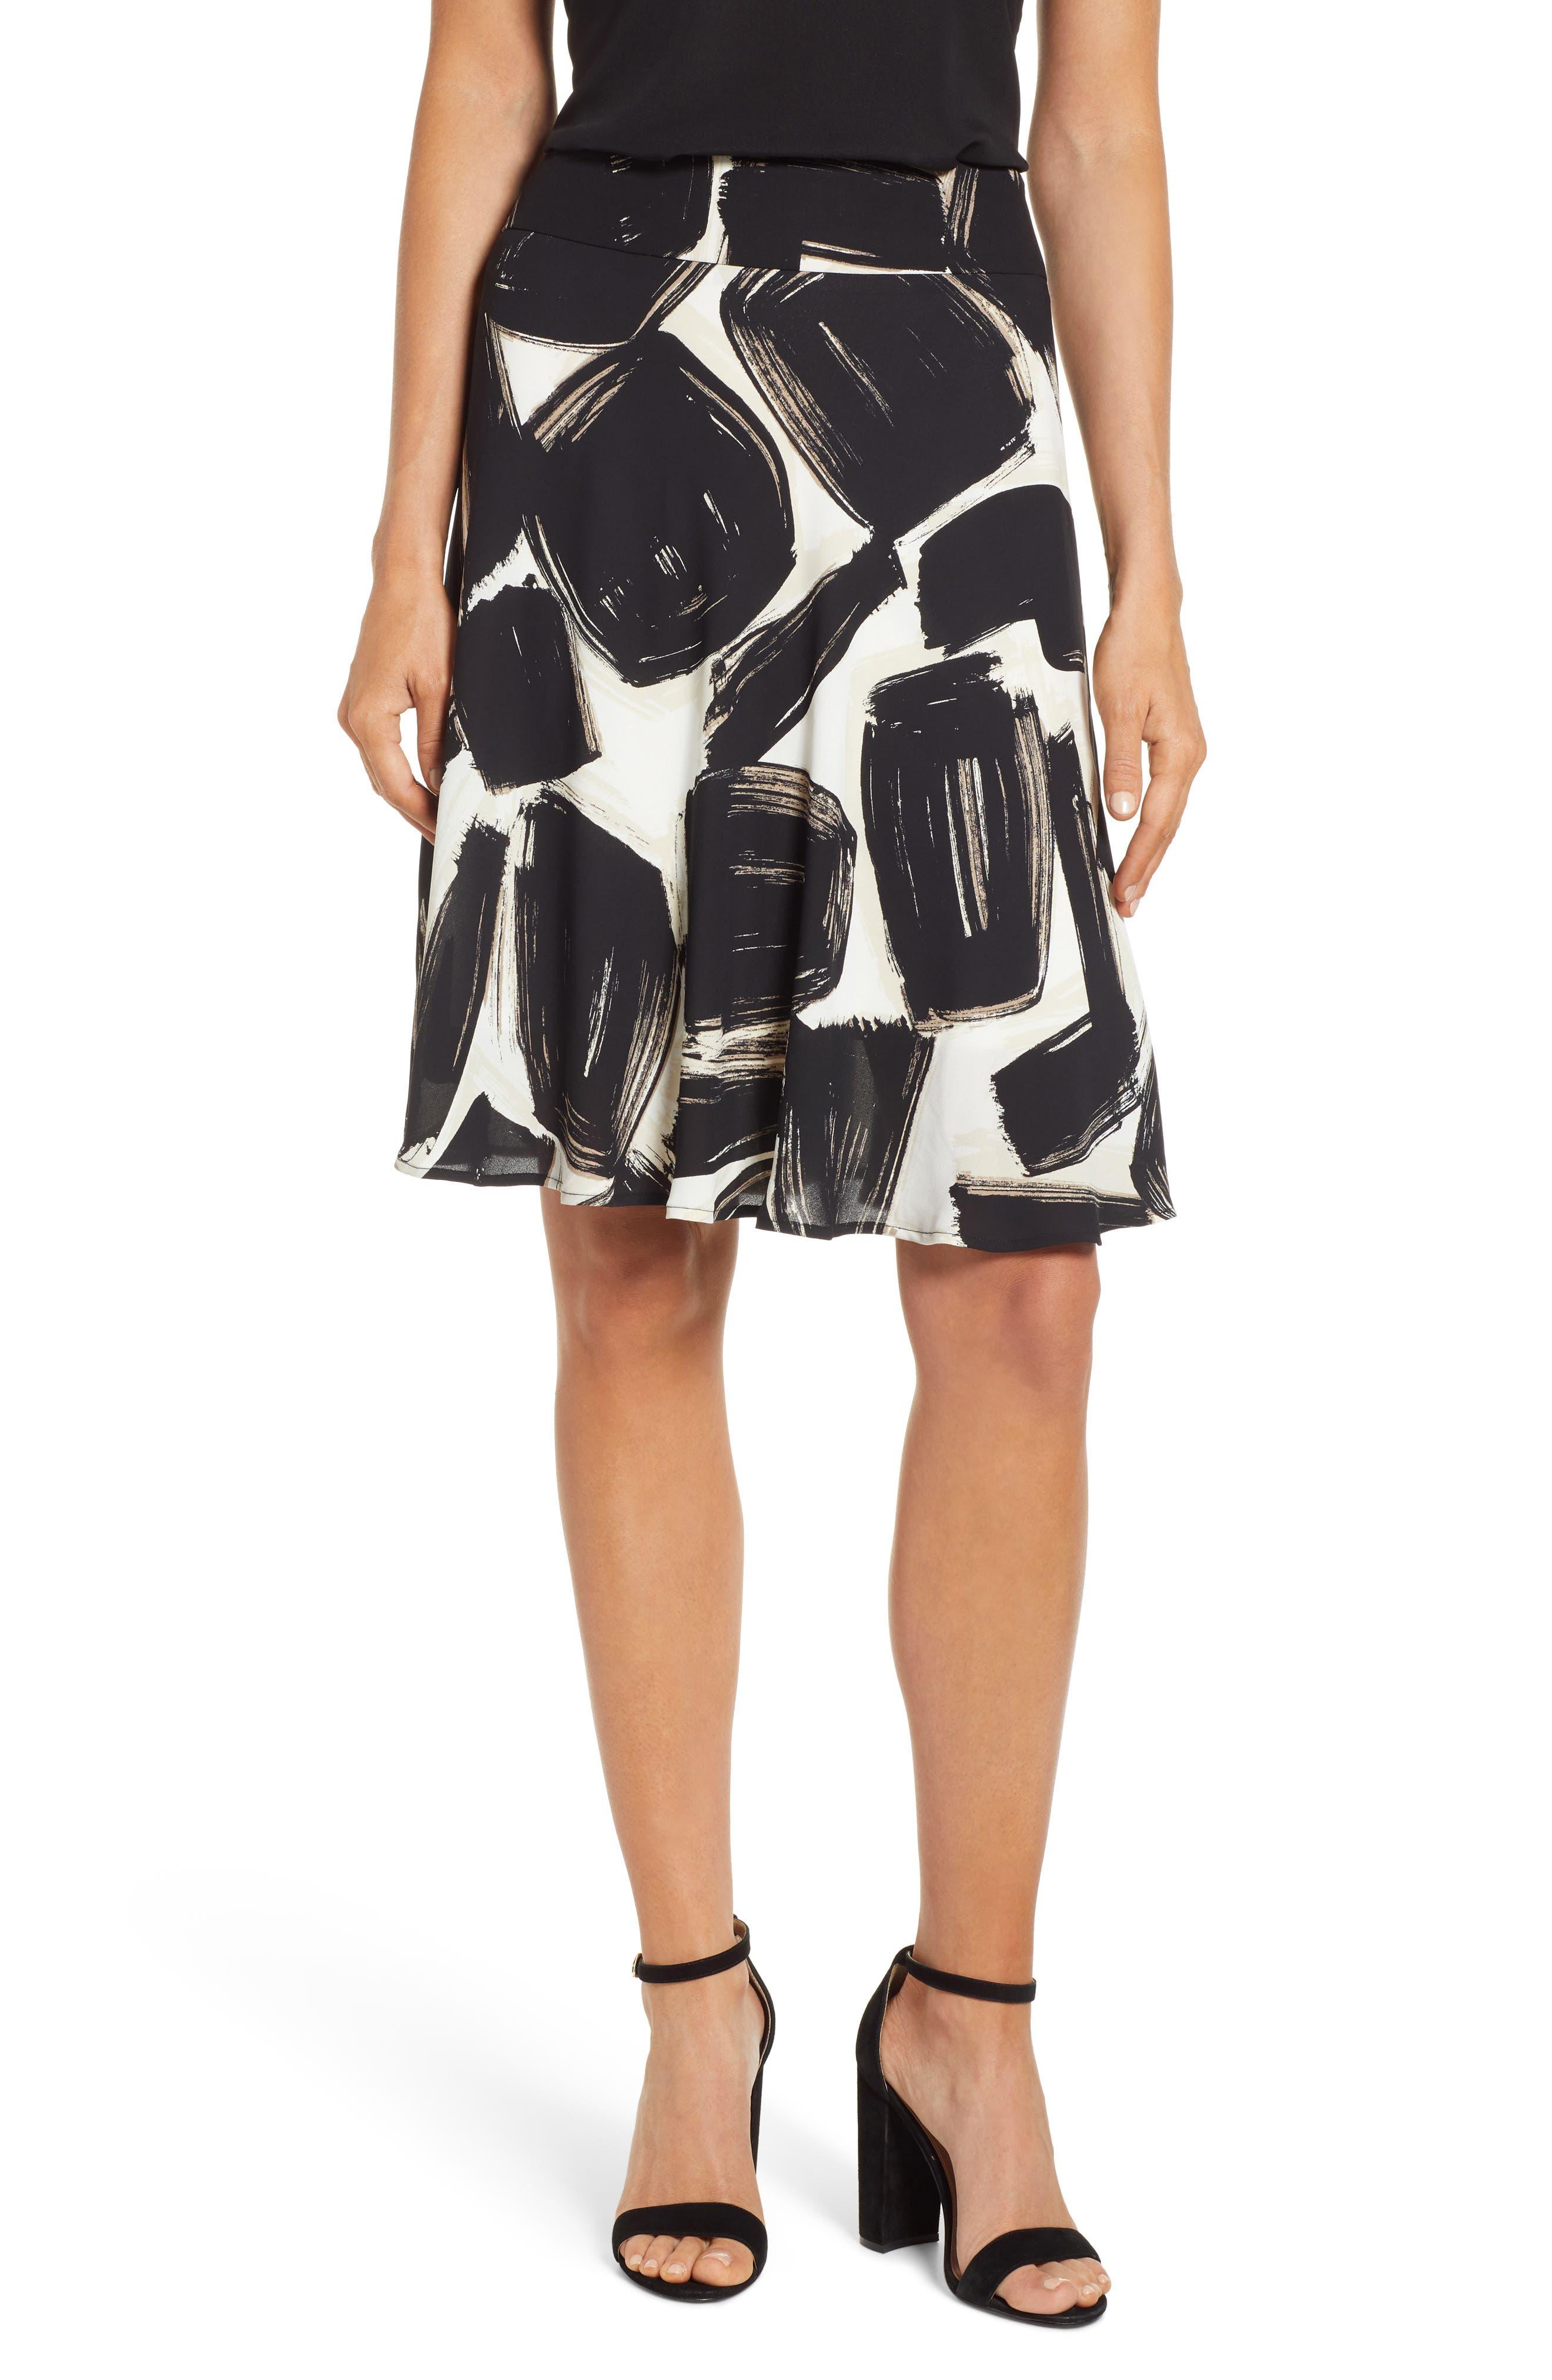 cc540474623 Women s Skirts Petite Clothing